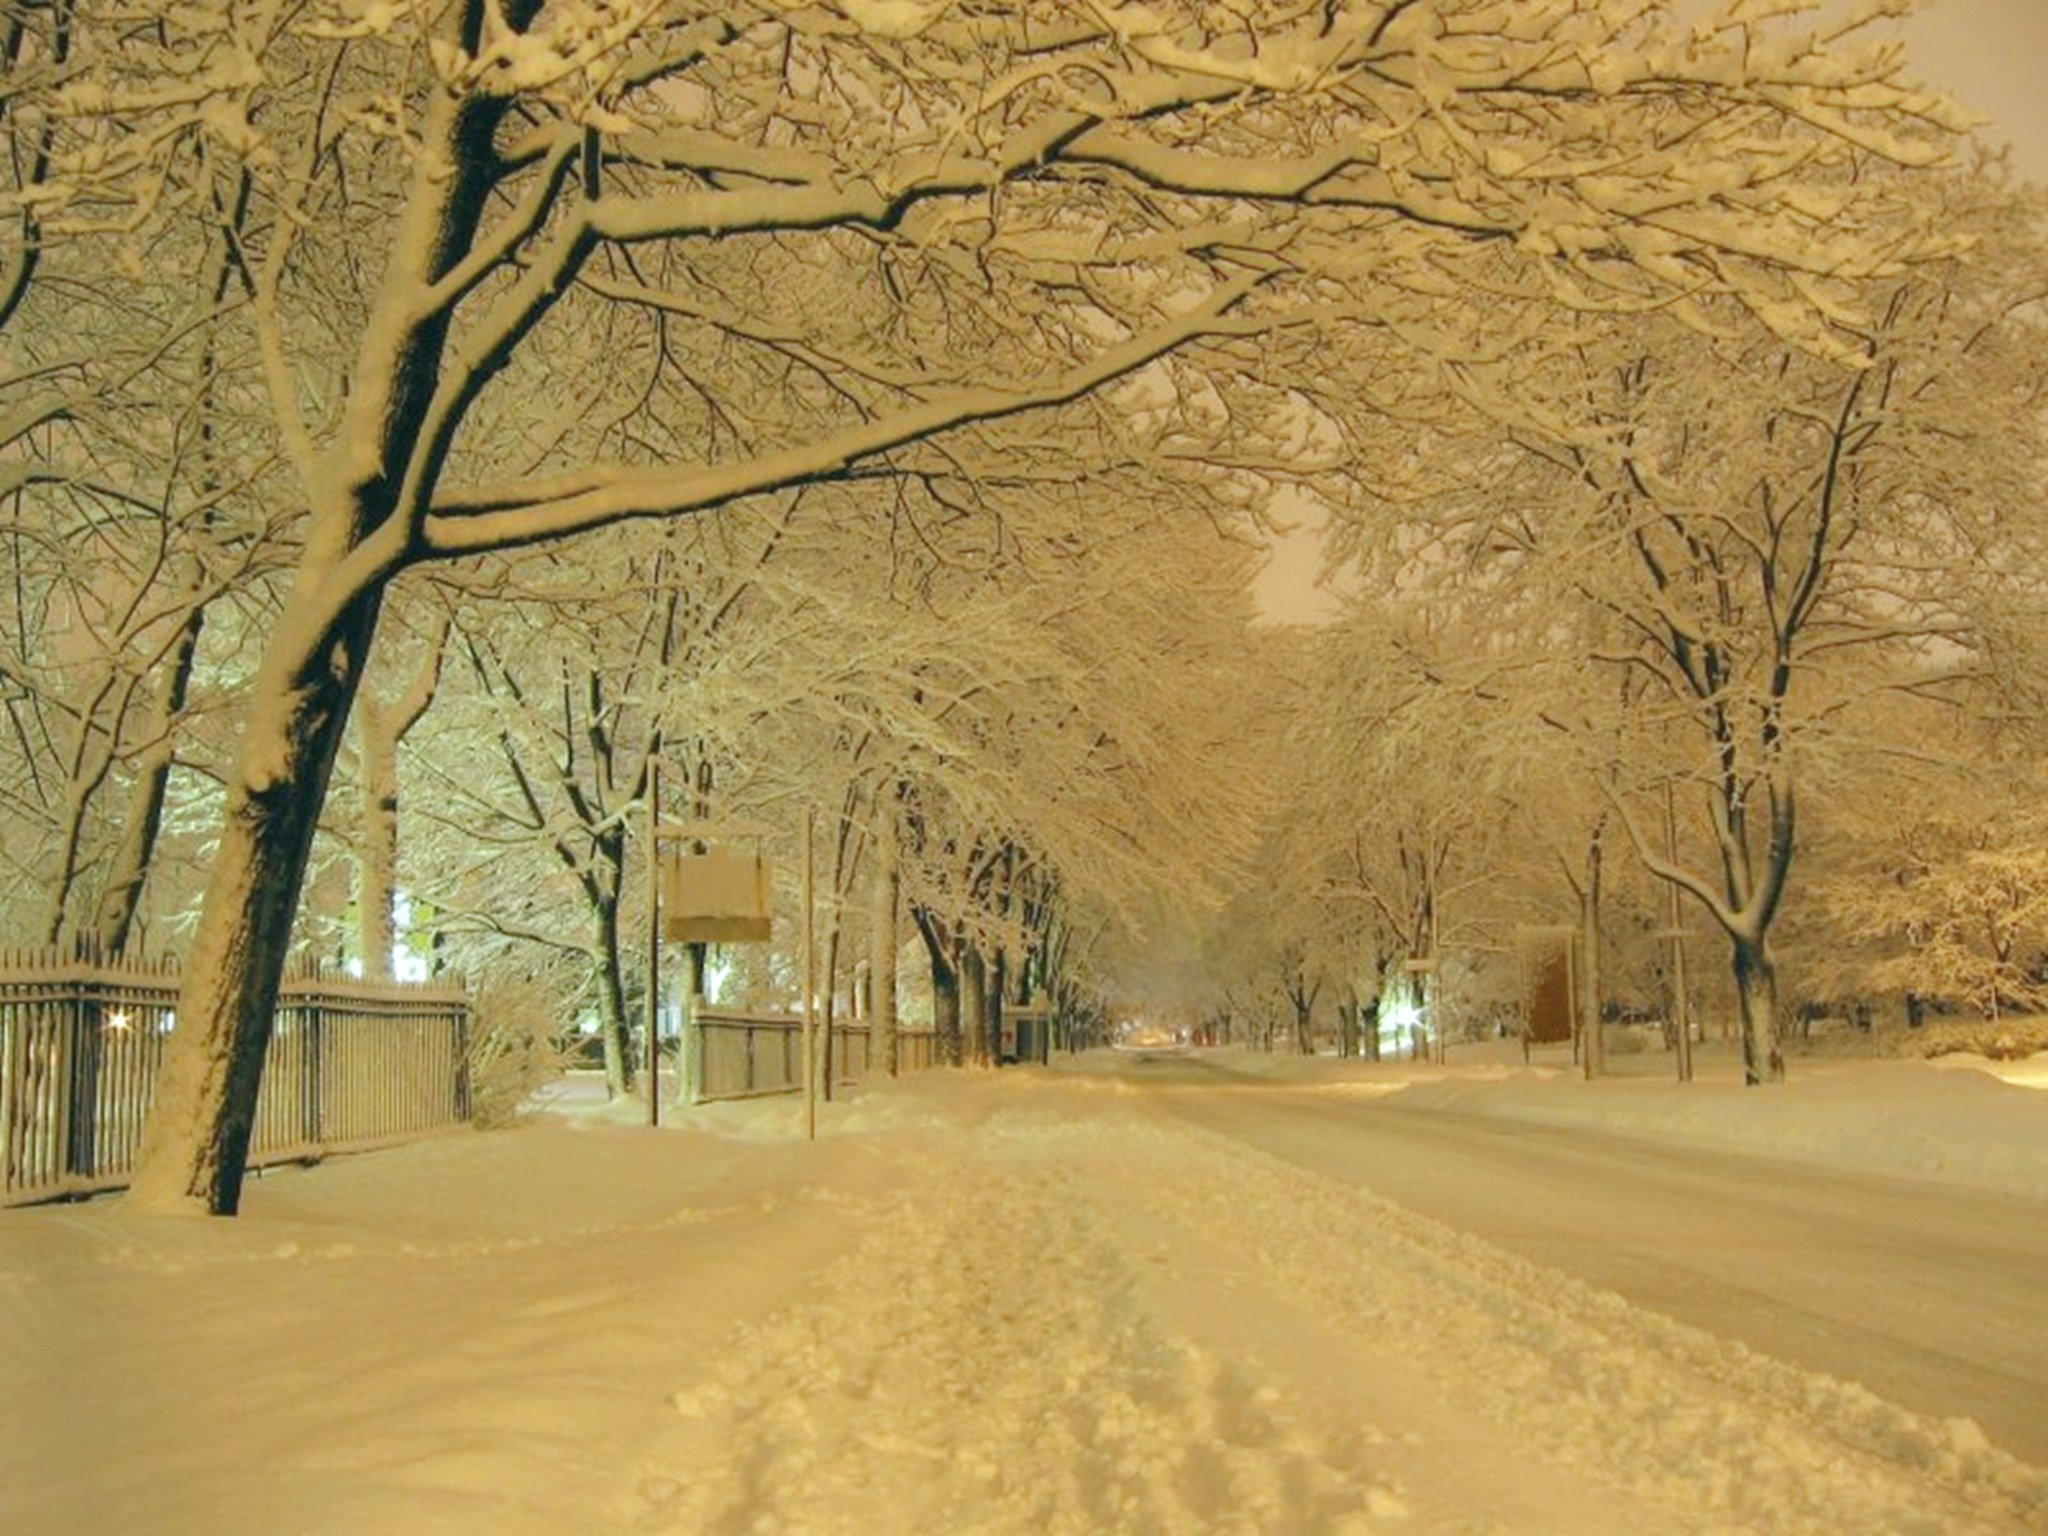 neige-au-canada_74747